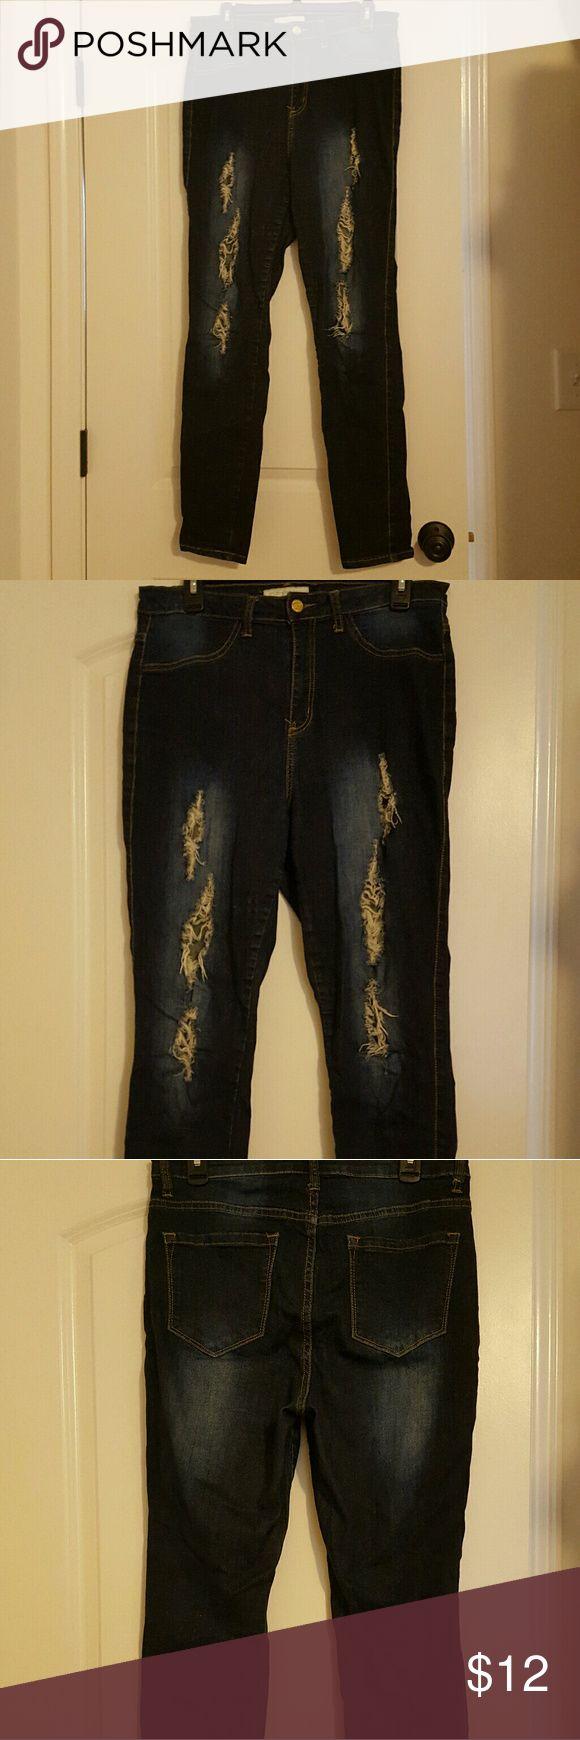 Nikki Minaj factory distressed skinny jeans Nikki Minaj stretch factory distressed skinny jeans size 11/12 Nikki Minaj  Jeans Skinny